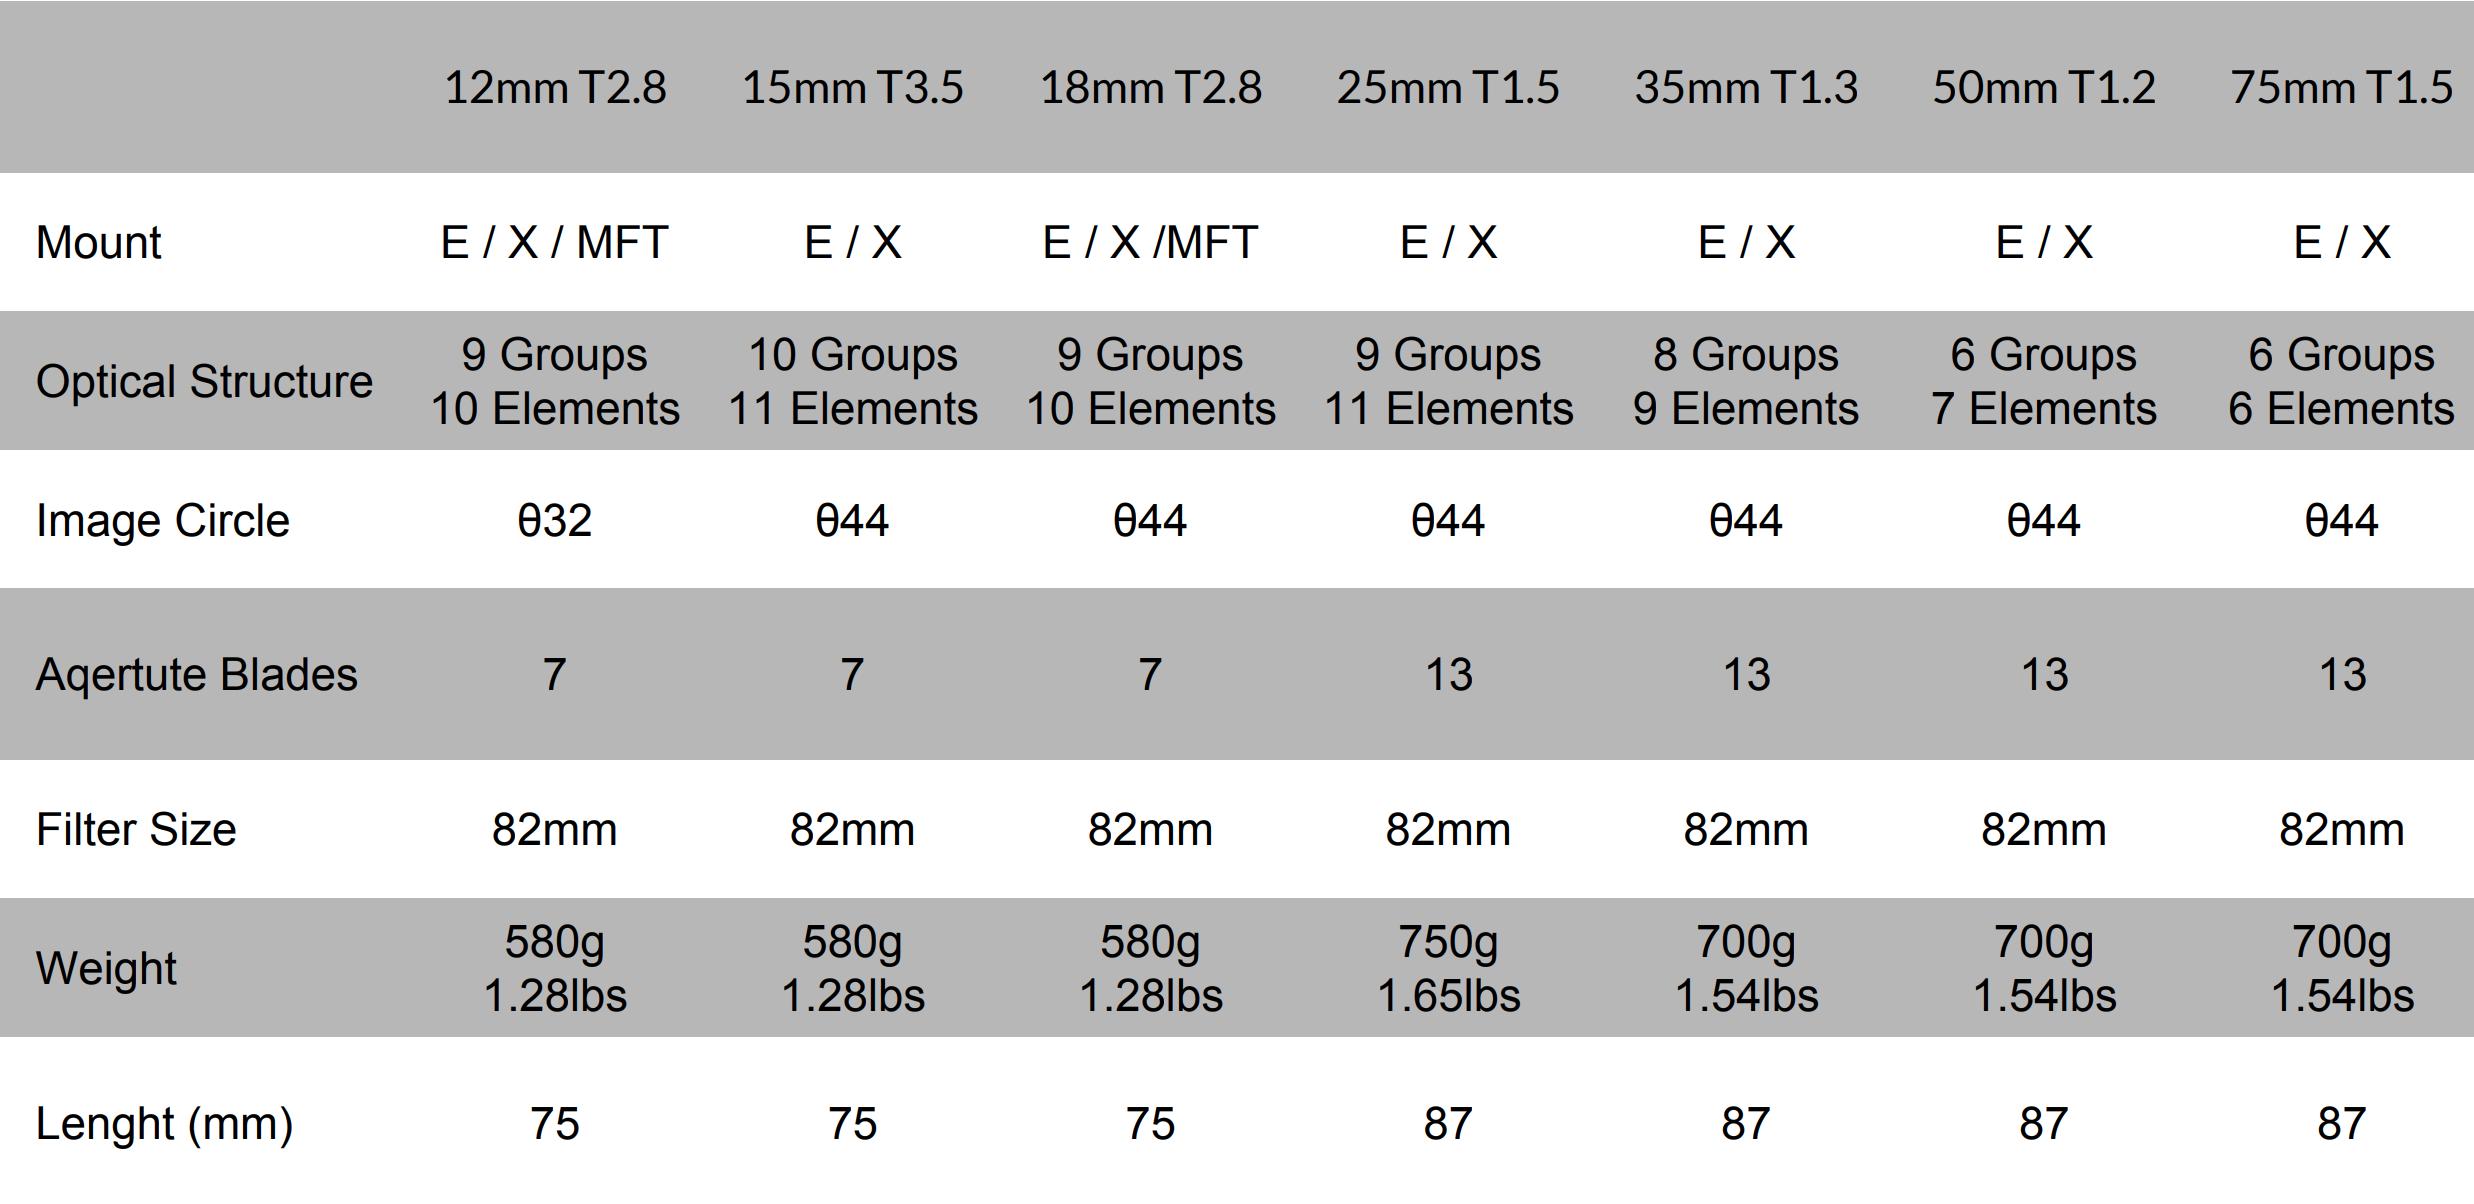 SLR Magic MicroPrime Cine 50mm T1.2 for Fuji X Mount